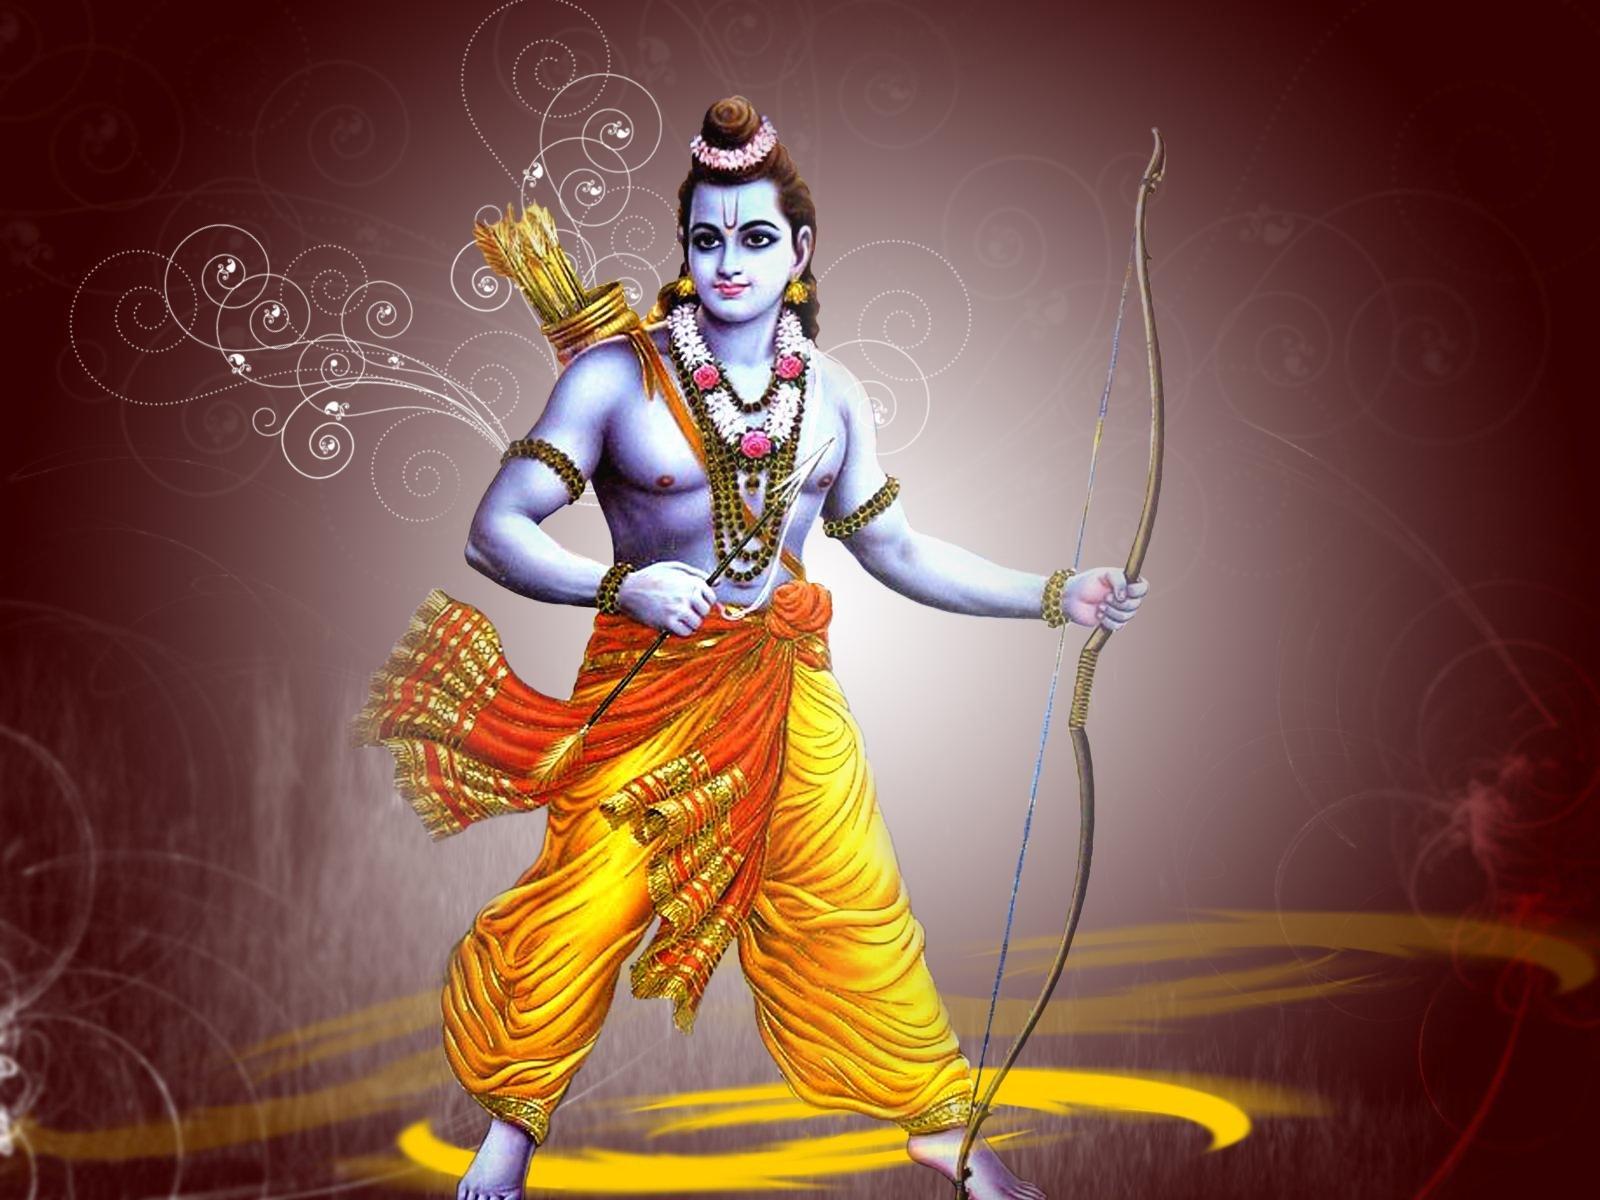 Hd wallpaper jai shri ram - Shri Ram Wallpaper